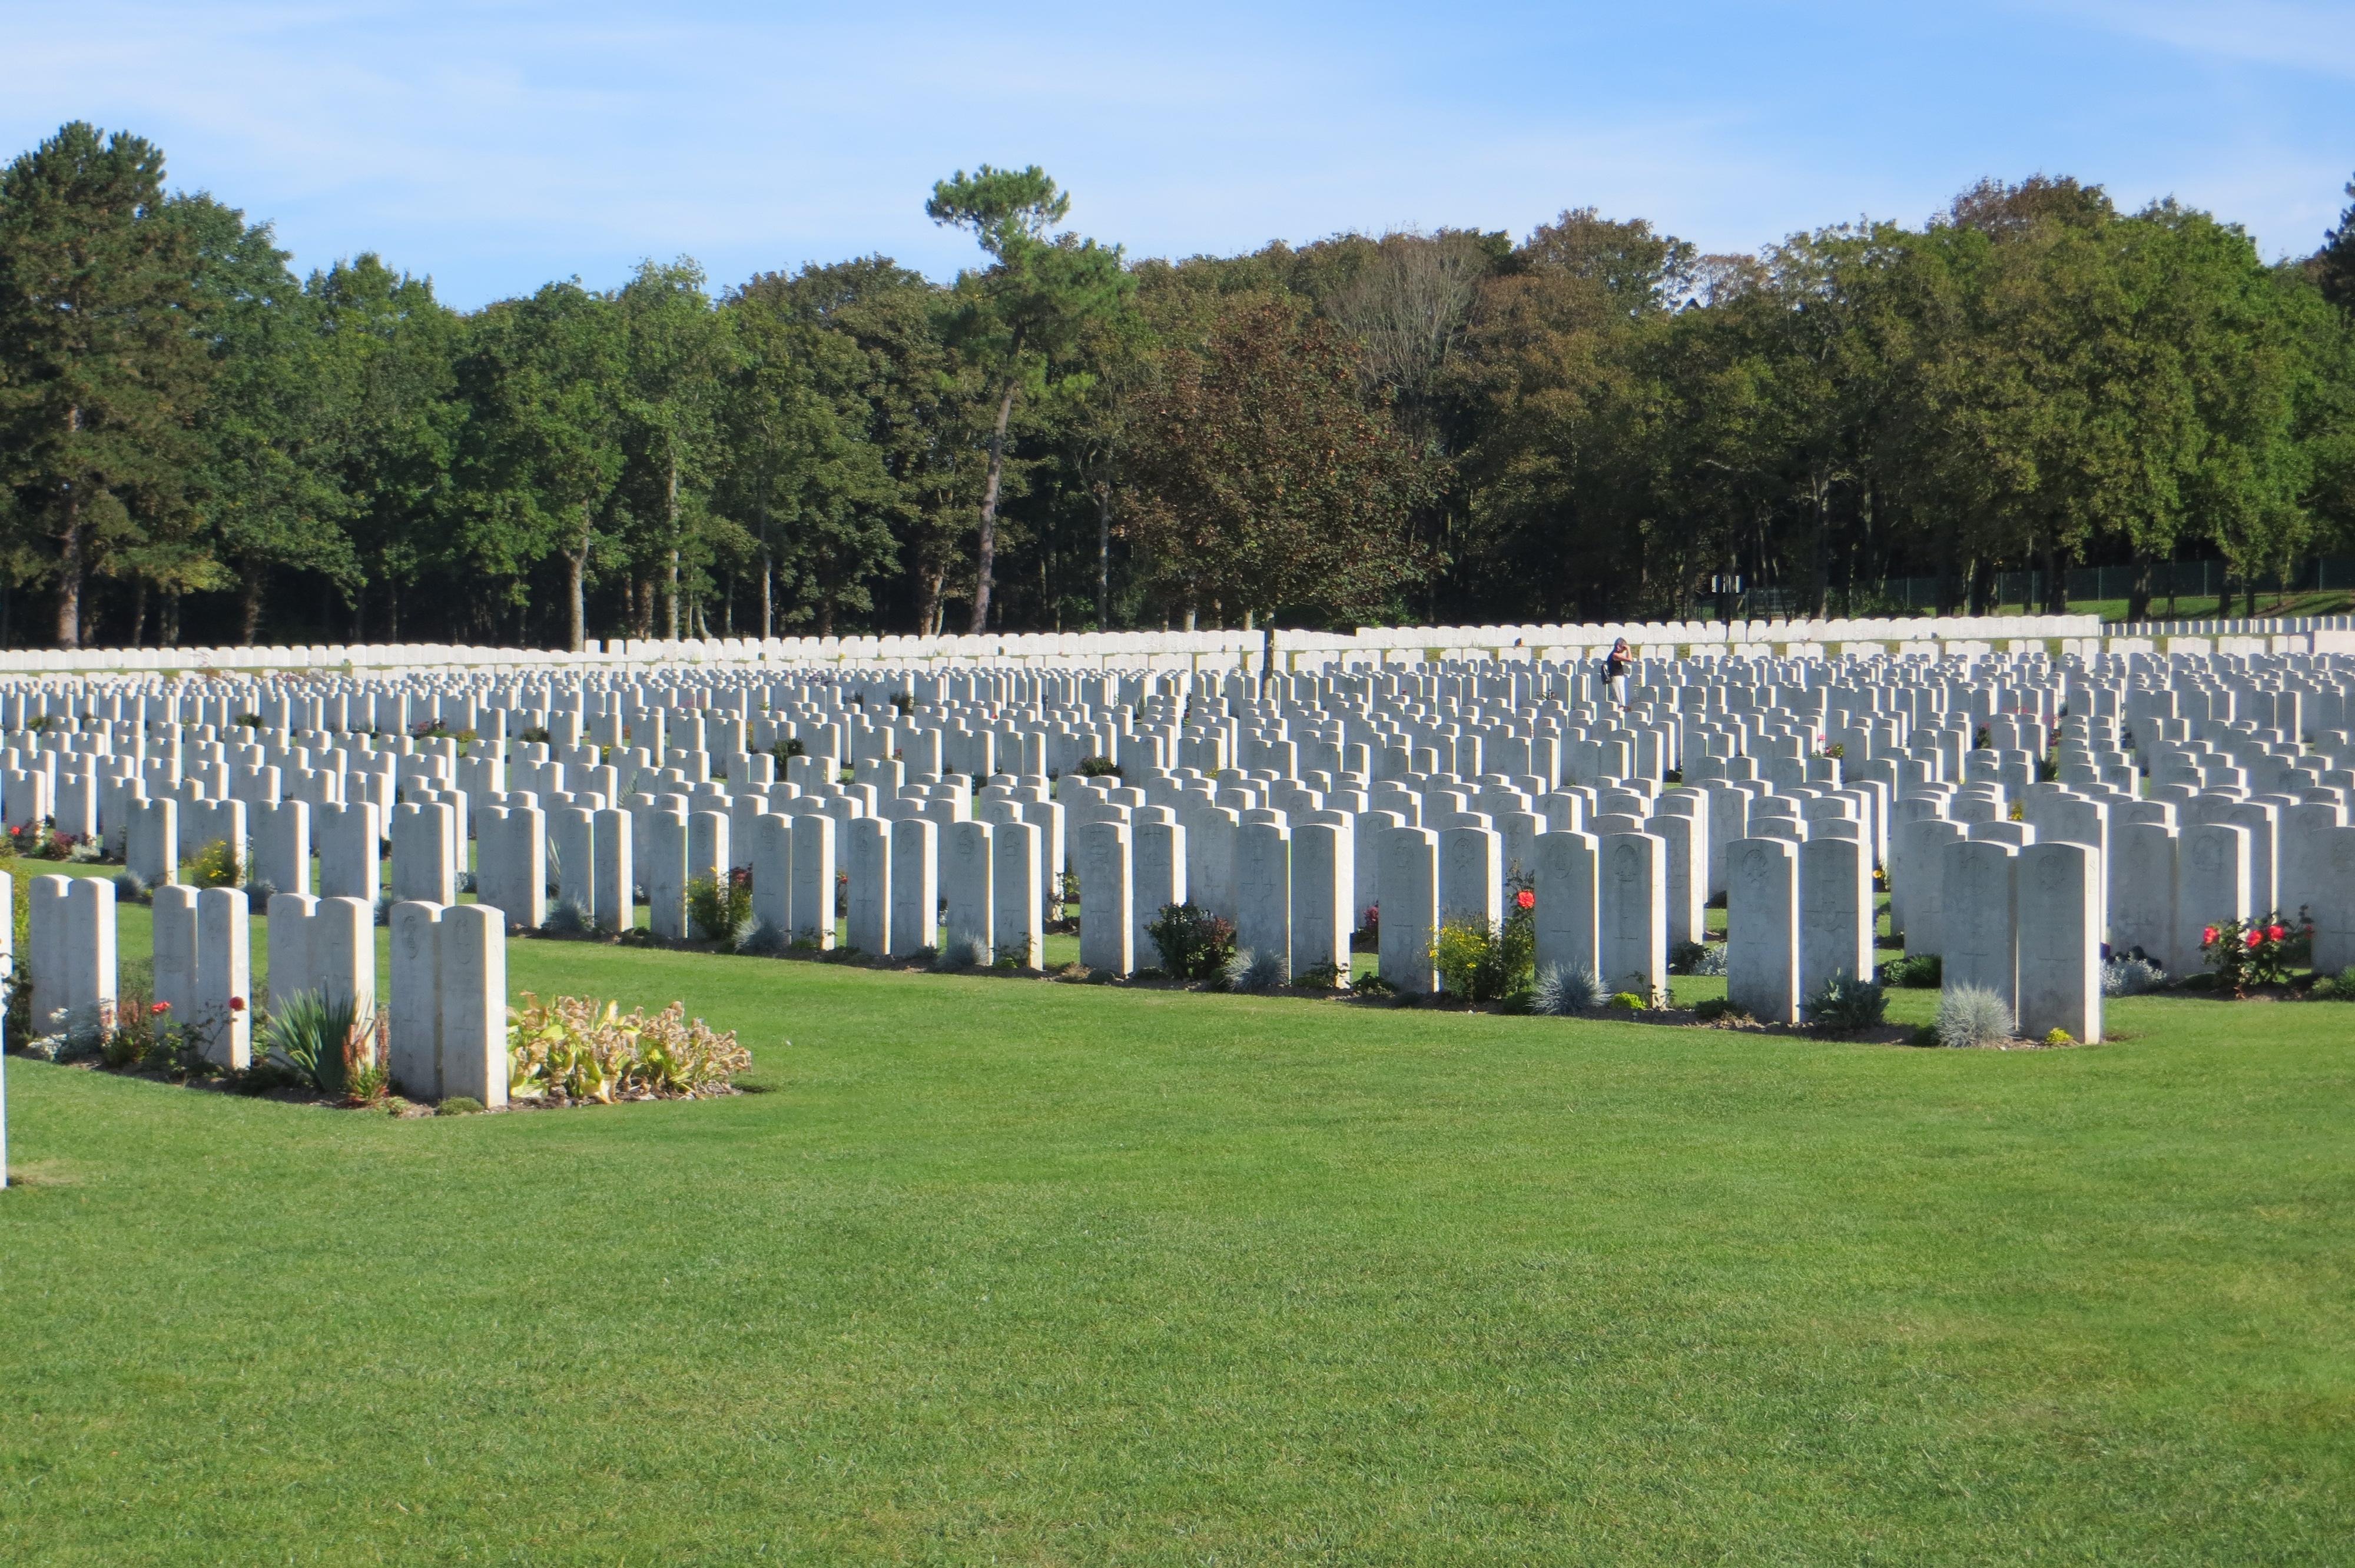 Etaples France  City pictures : Etaples Military Cemetery, Etaples, France